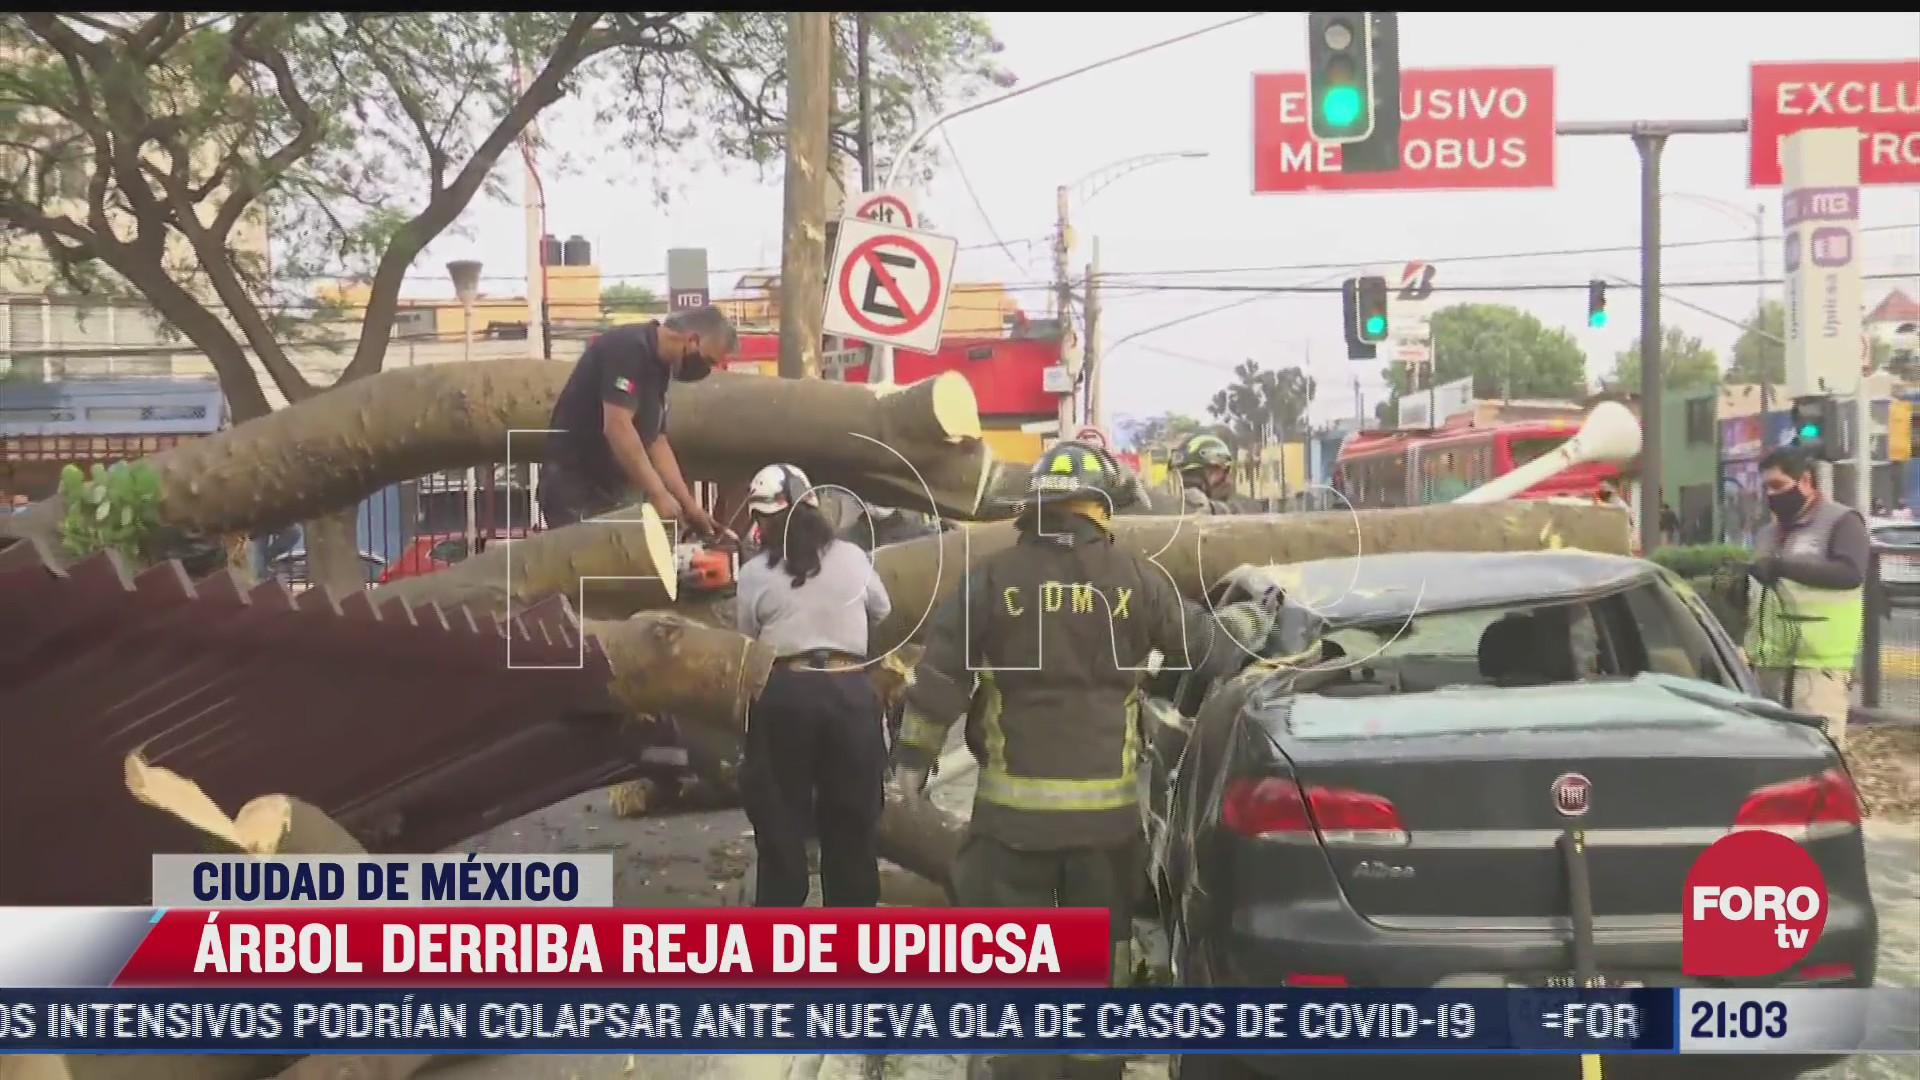 valle de mexico registra intenso olor a quemado